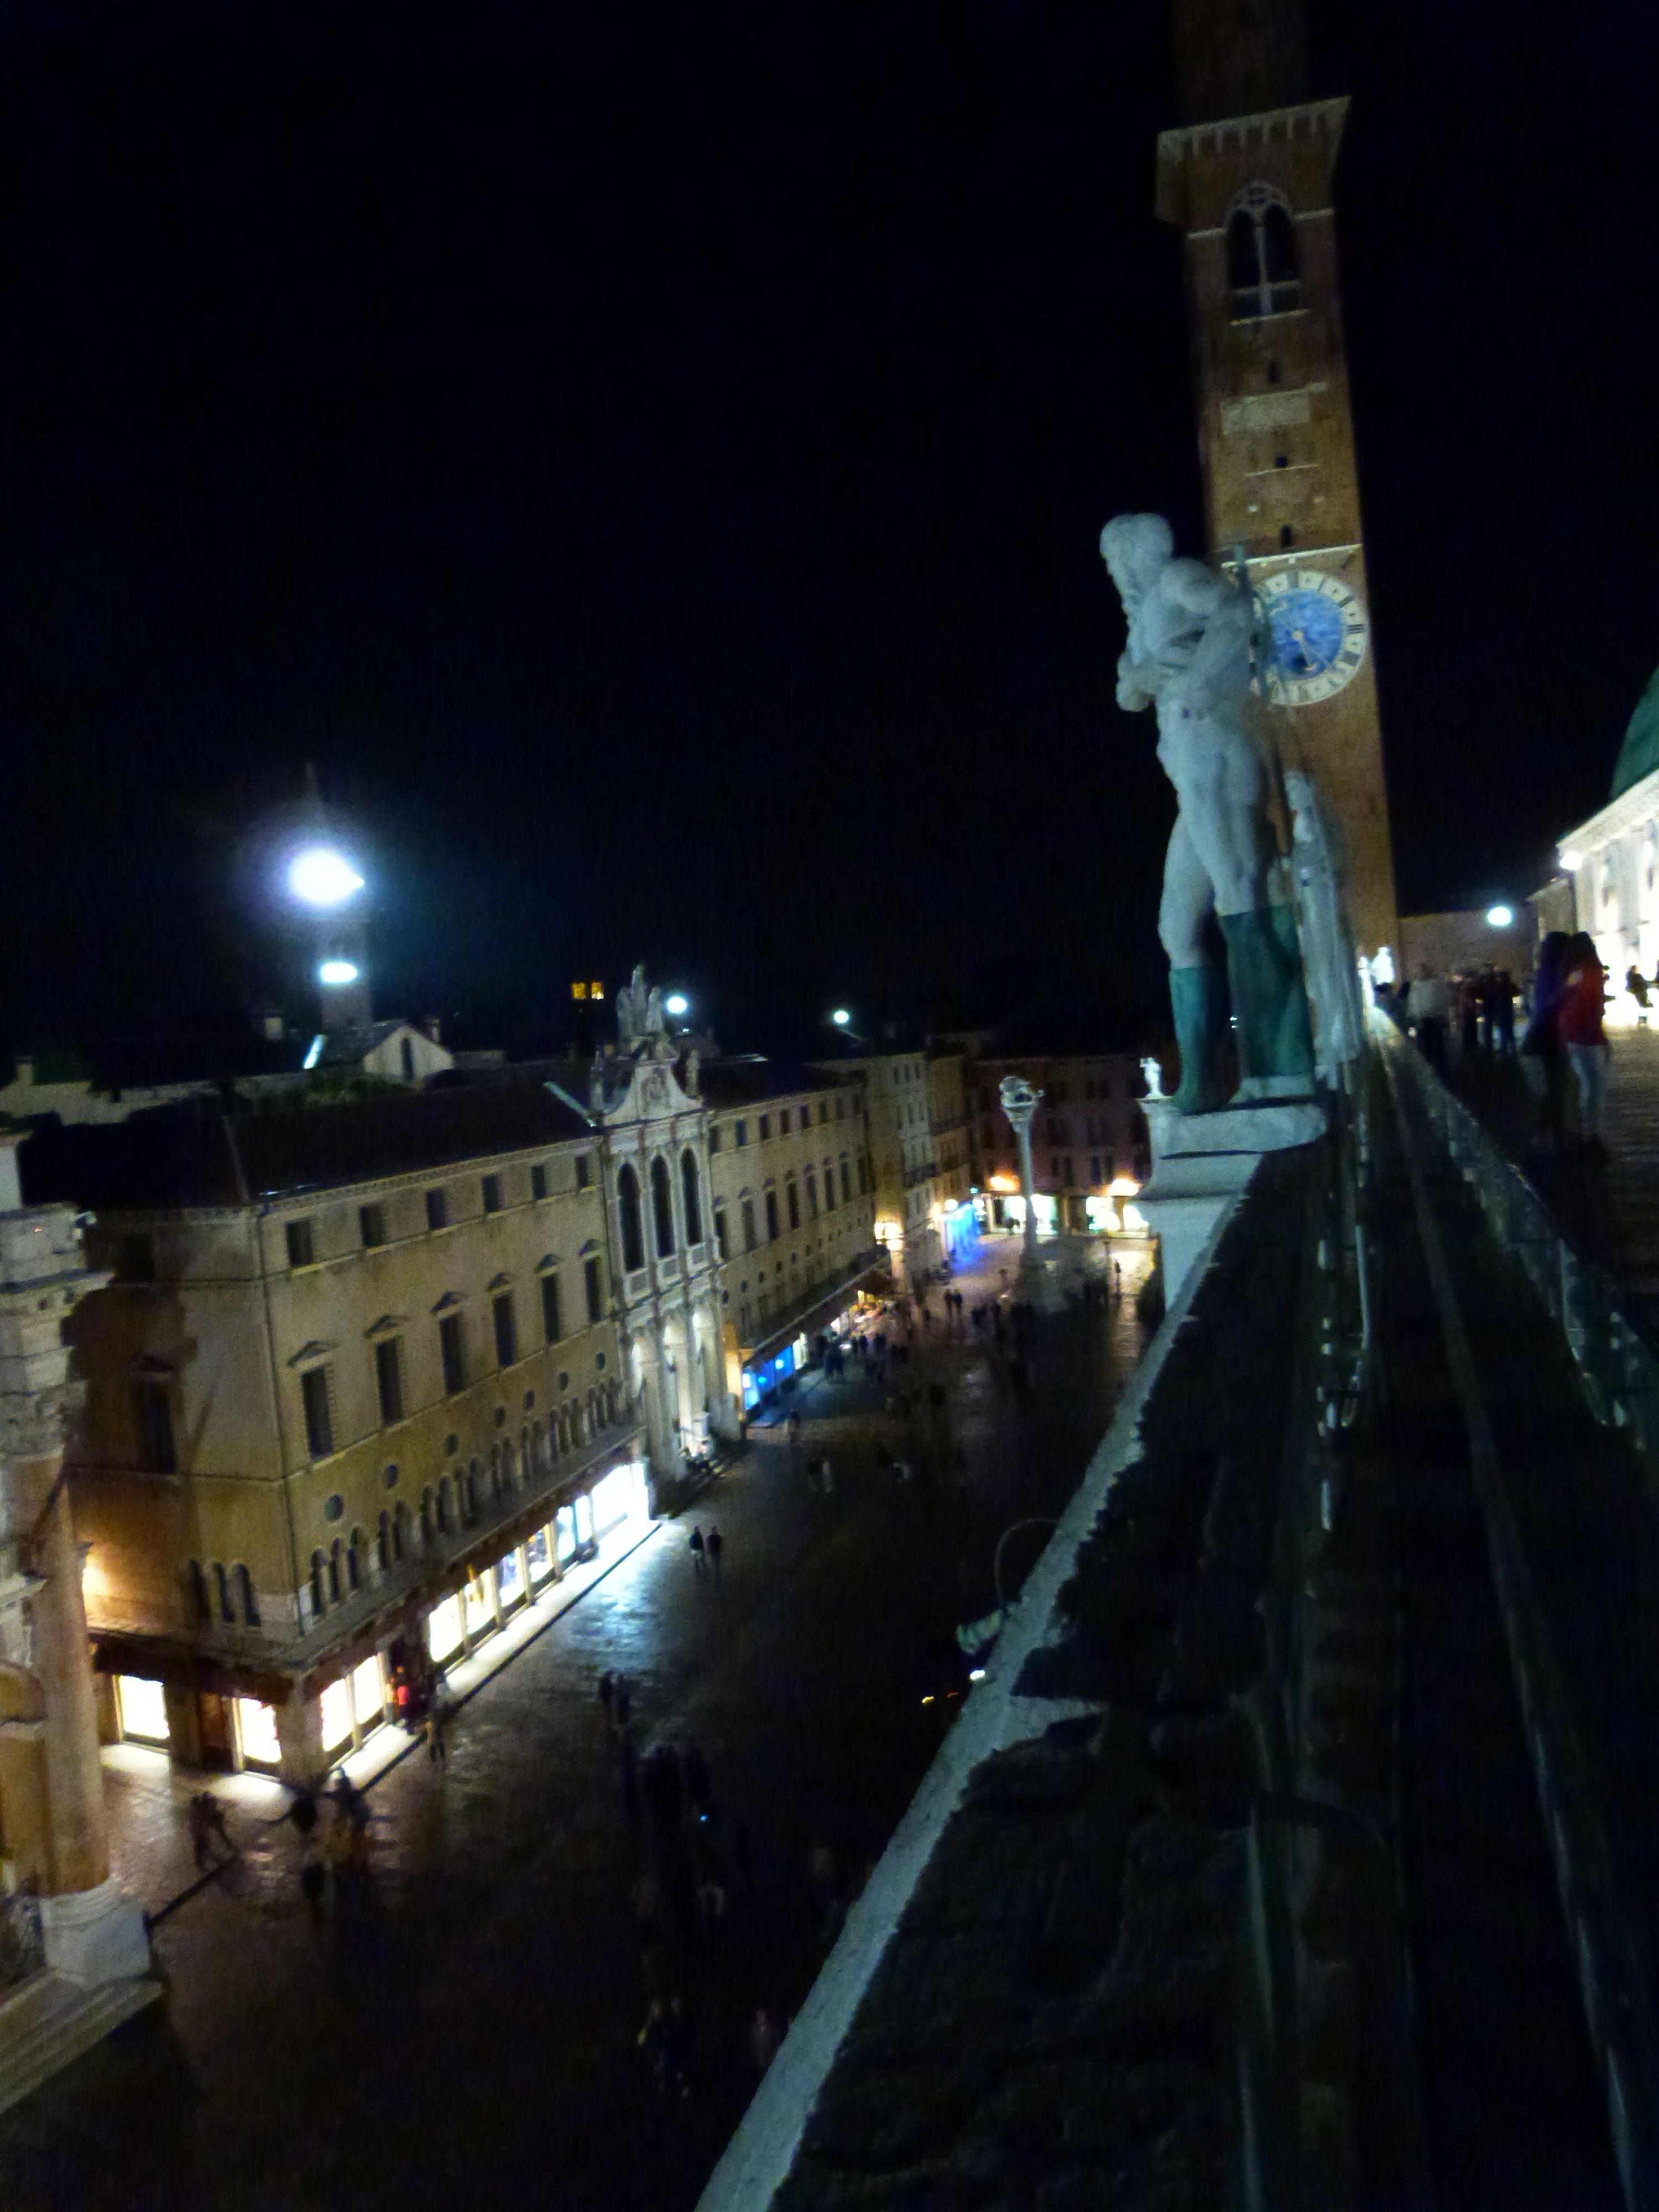 NotteDeiMusei #ndm13 Visite in notturna alla terrazza della ...